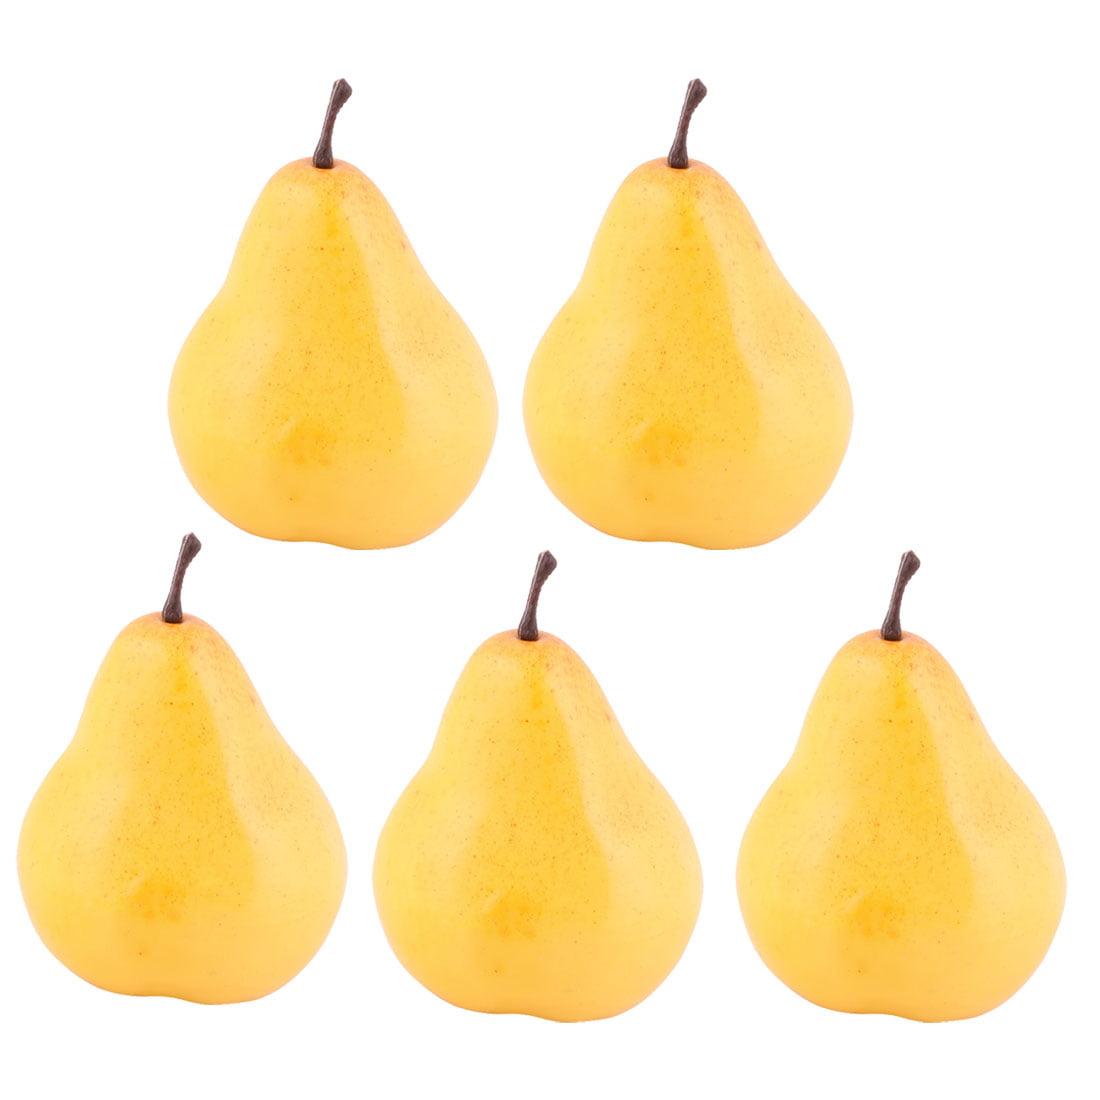 Household Table Decor Foam Handmade Simulation Artificial Fruit Pear Yellow 5pcs